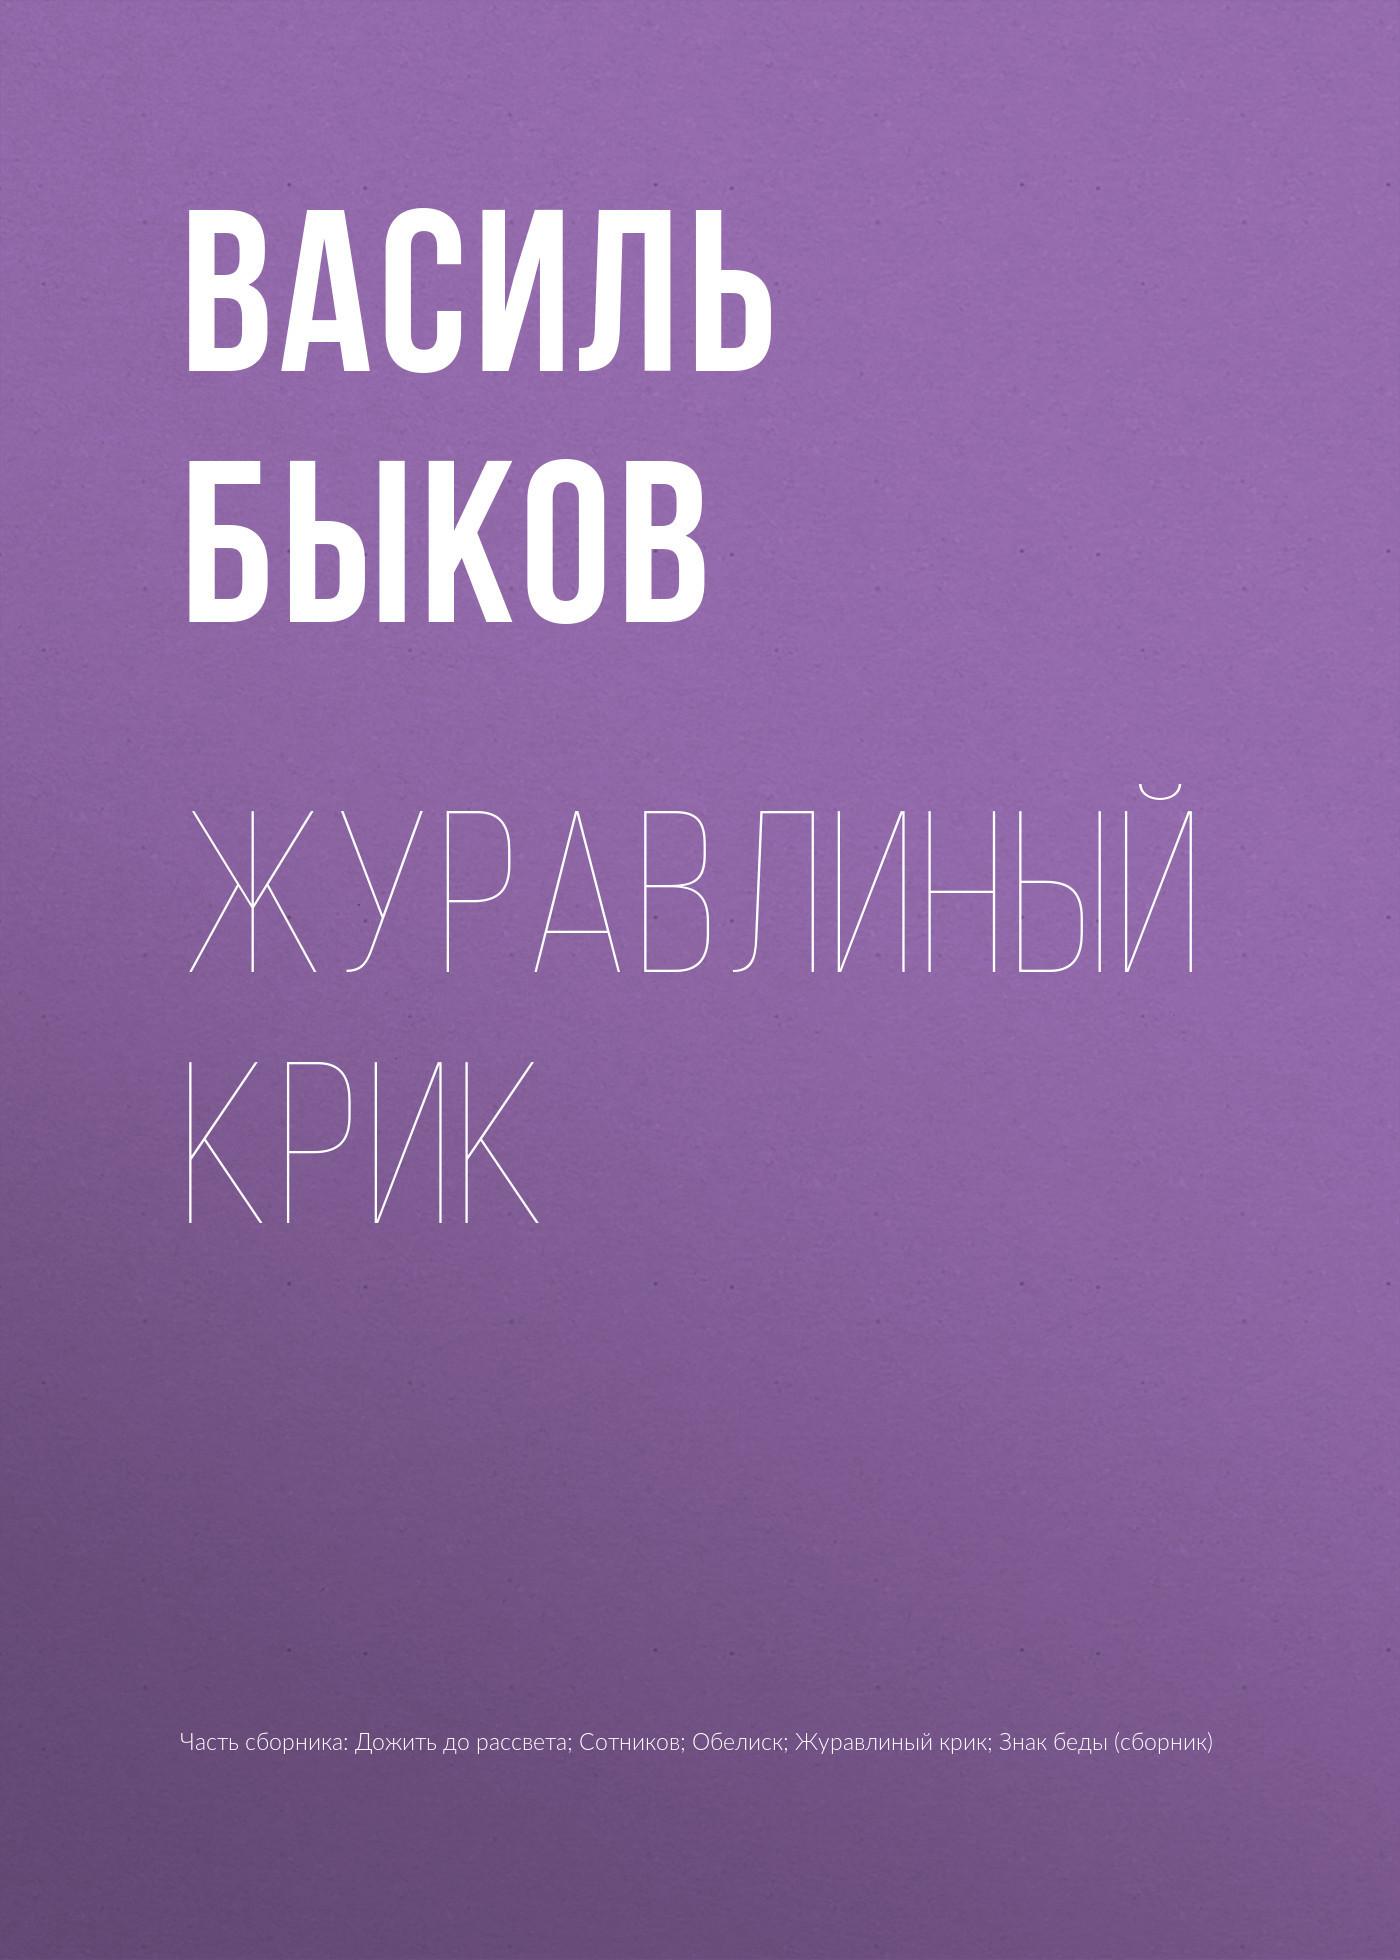 На обложке символ данного произведения 36/69/16/36691654.bin.dir/36691654.cover.jpg обложка